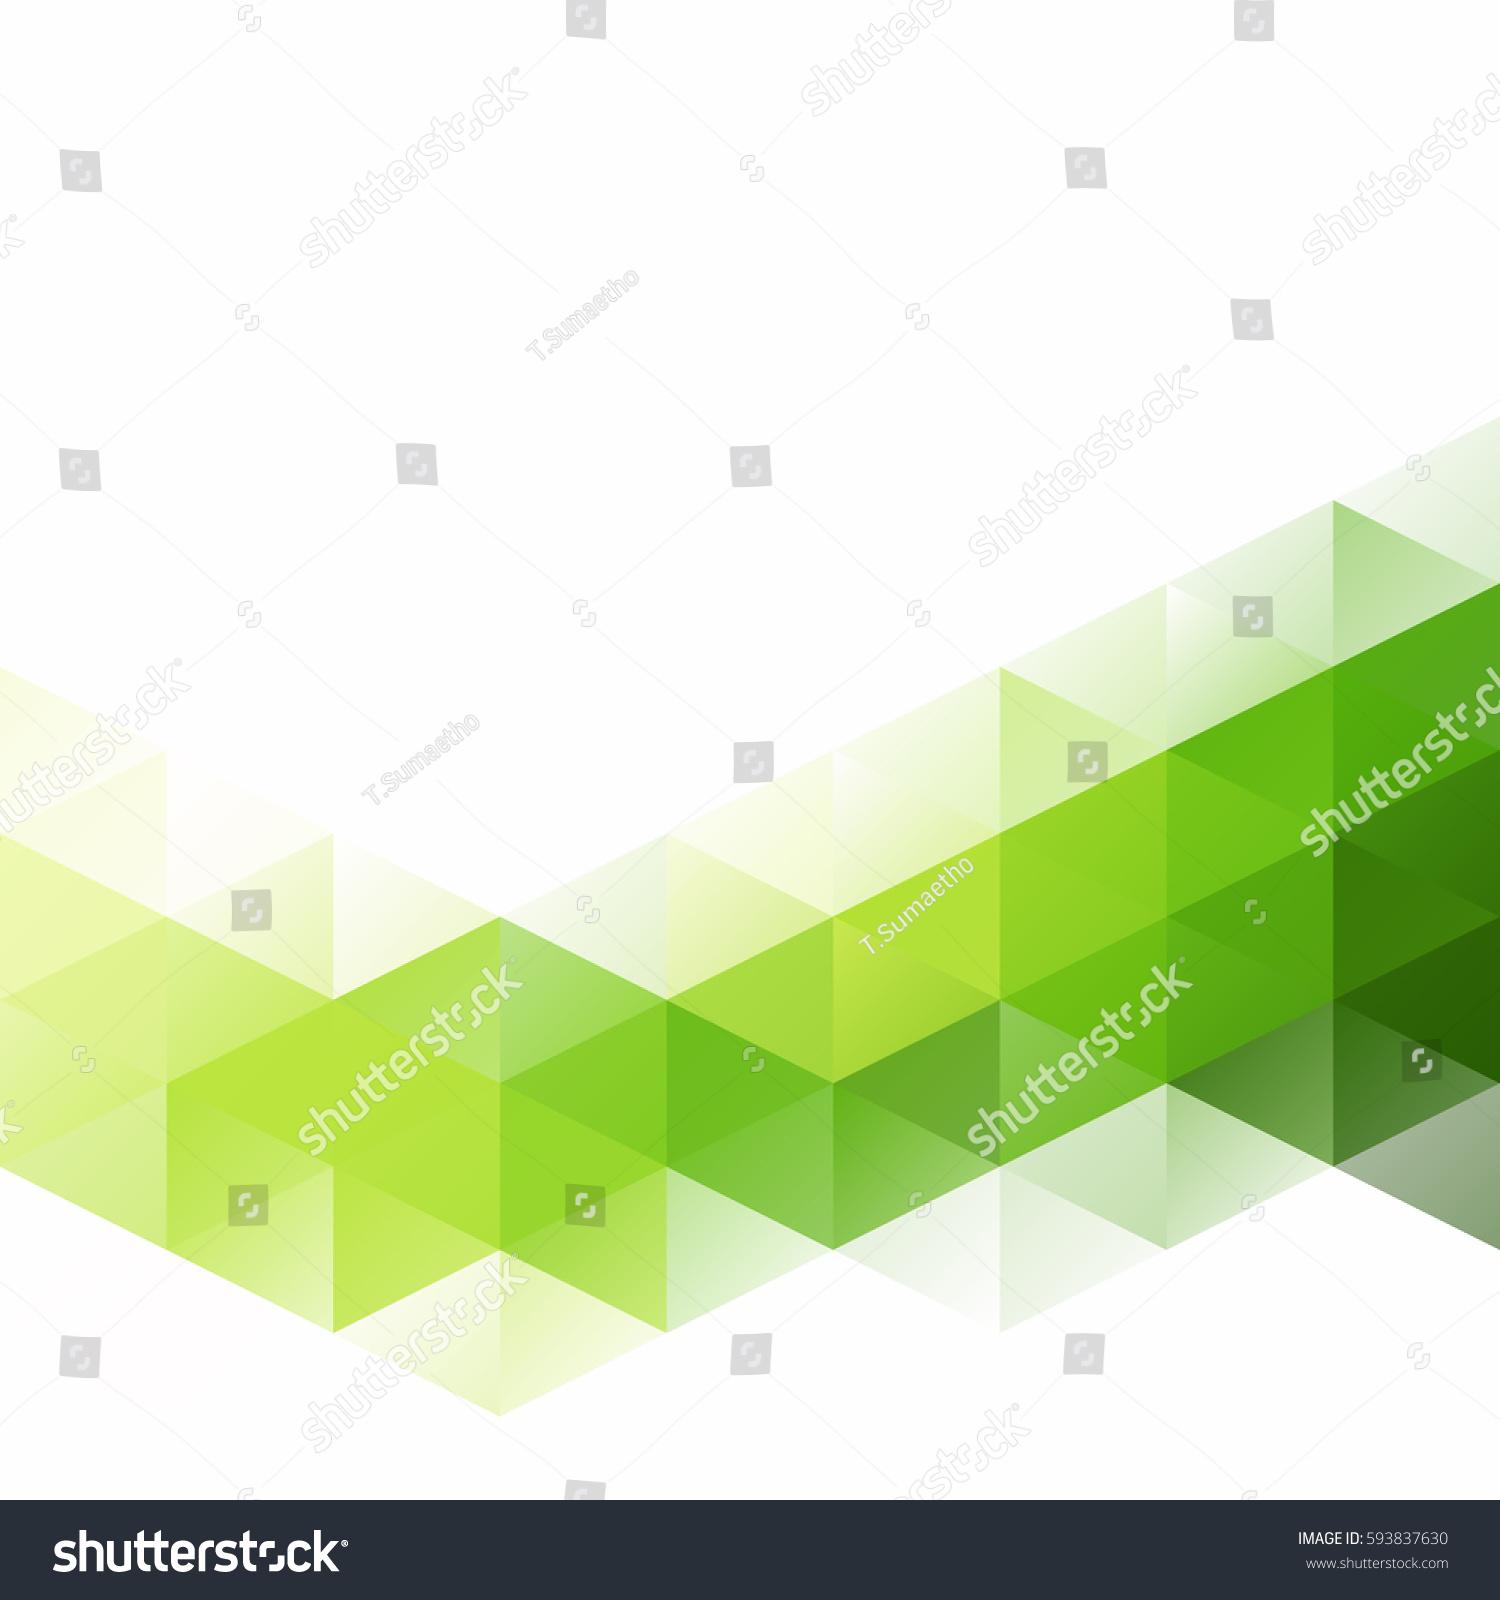 green grid mosaic background creative design のベクター画像素材